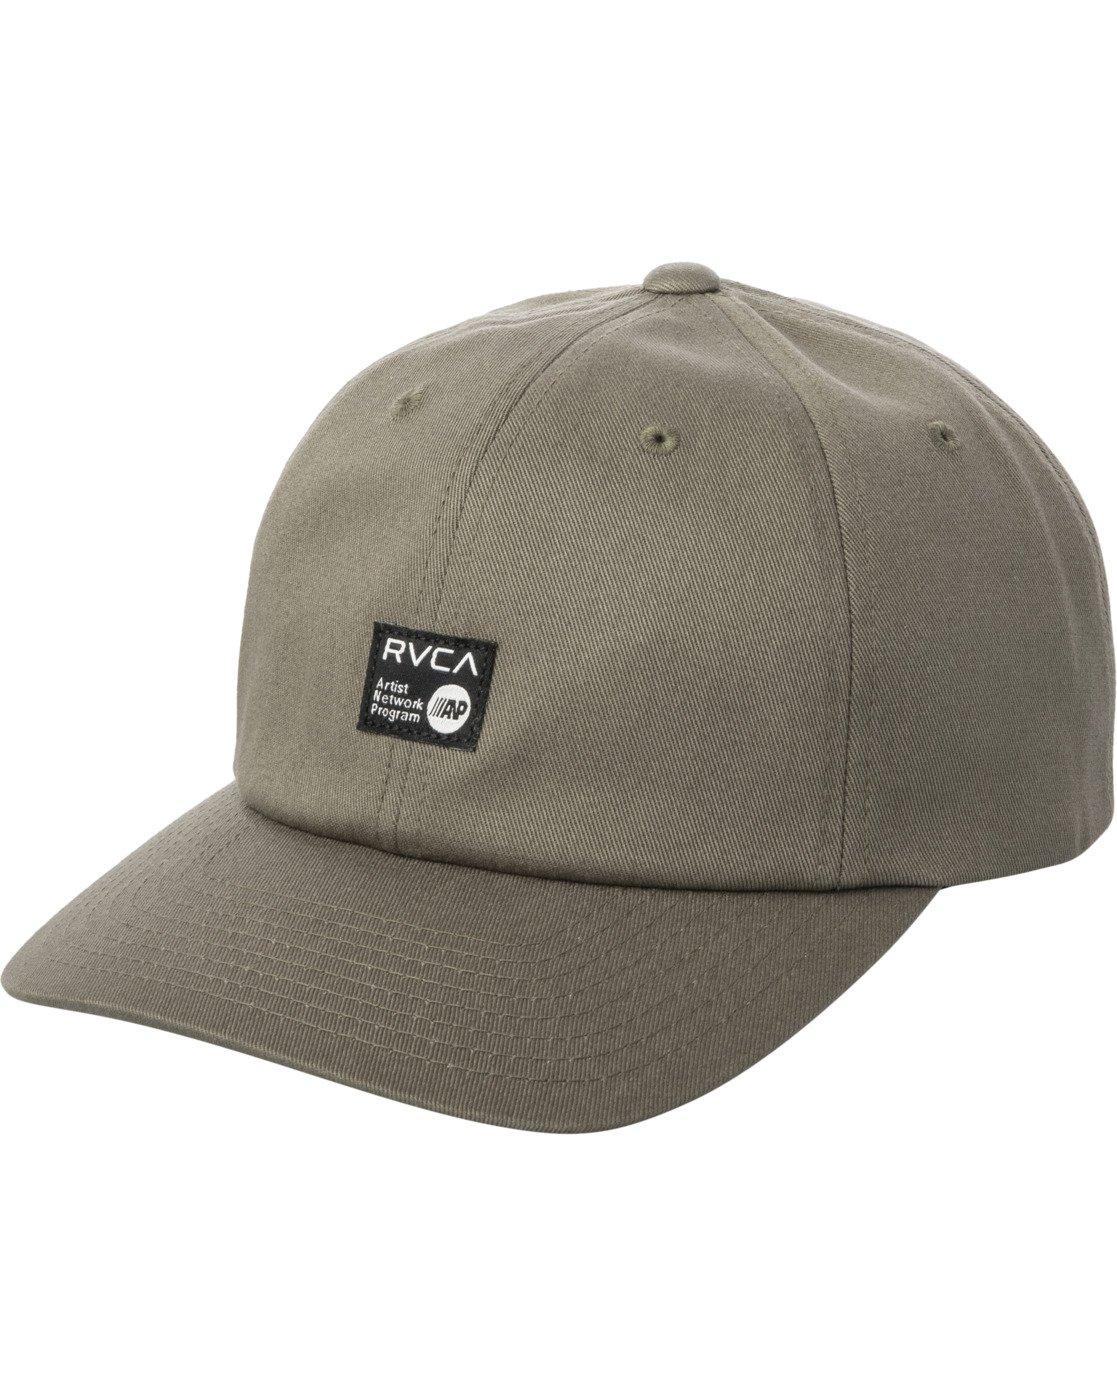 0 ANP CLASPBACK HAT Green MAHW3RAC RVCA